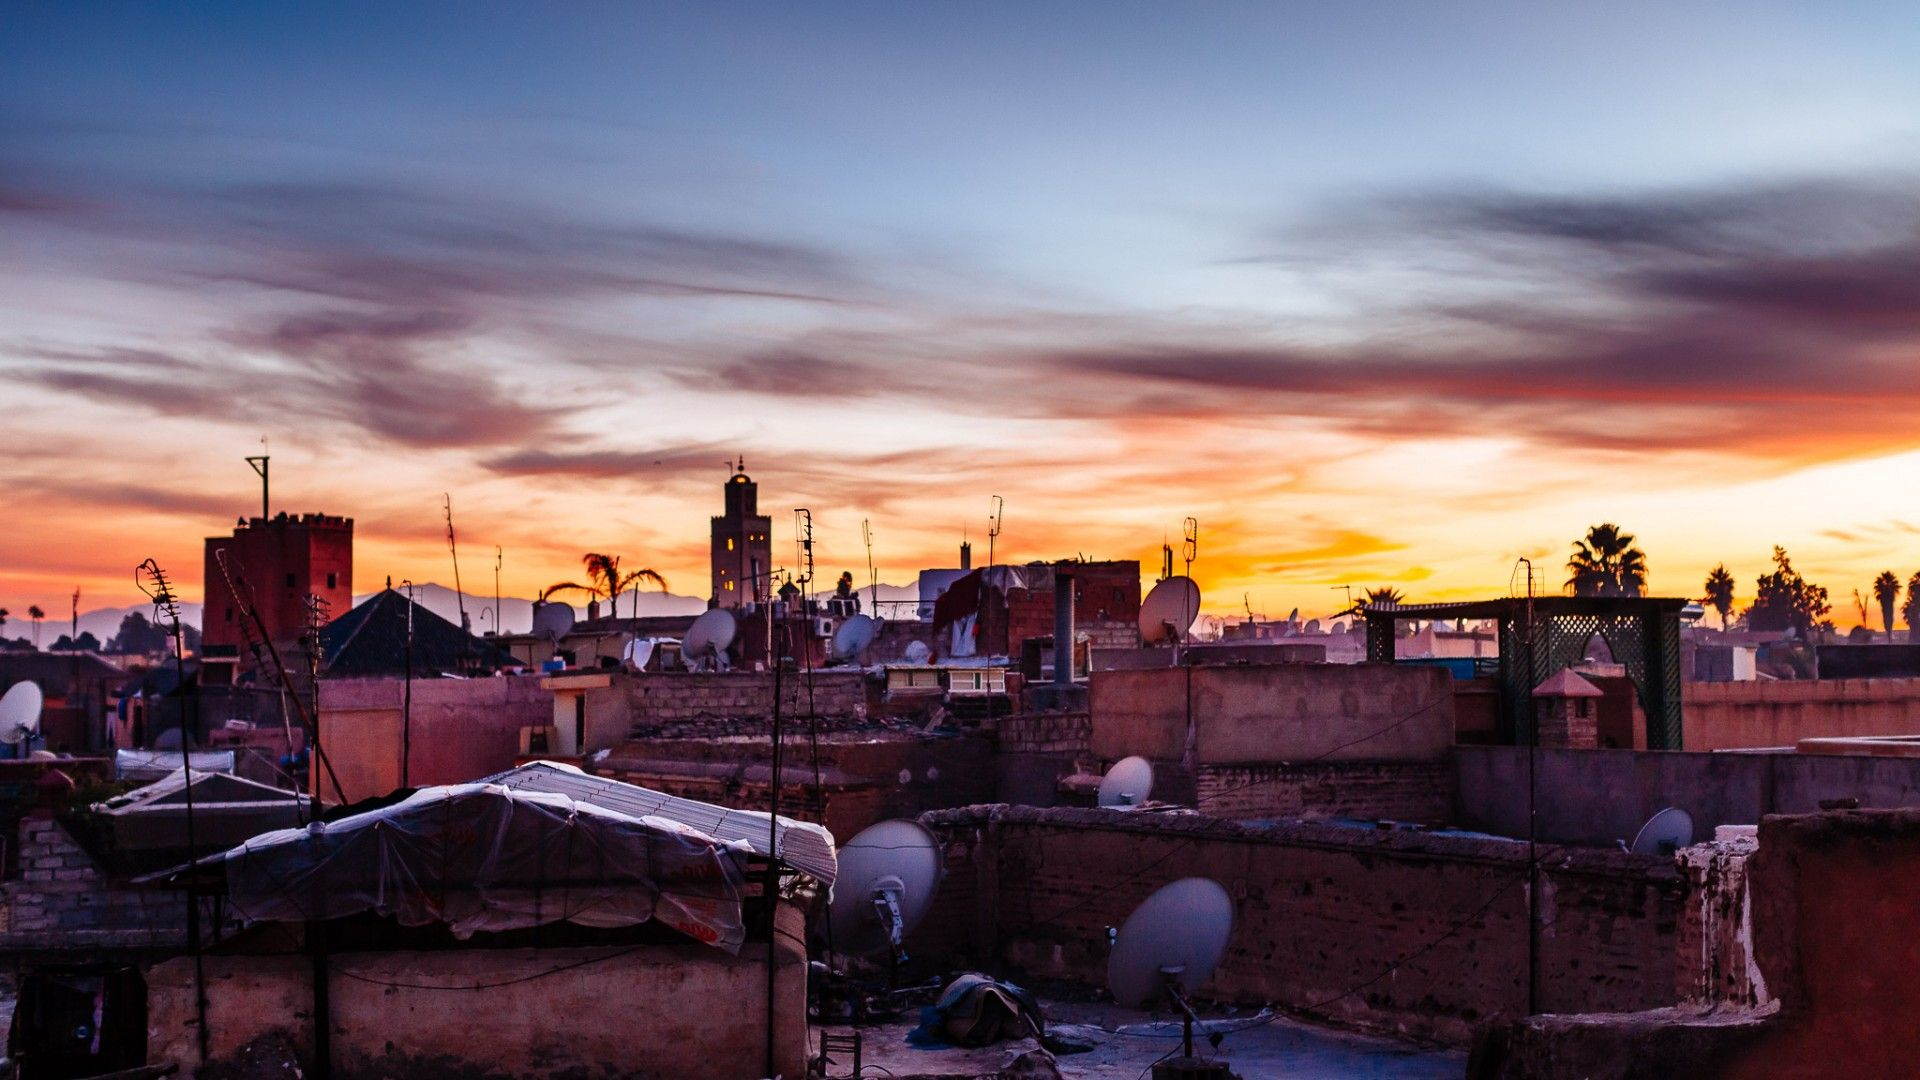 Marrakech Rooftops at Sunset